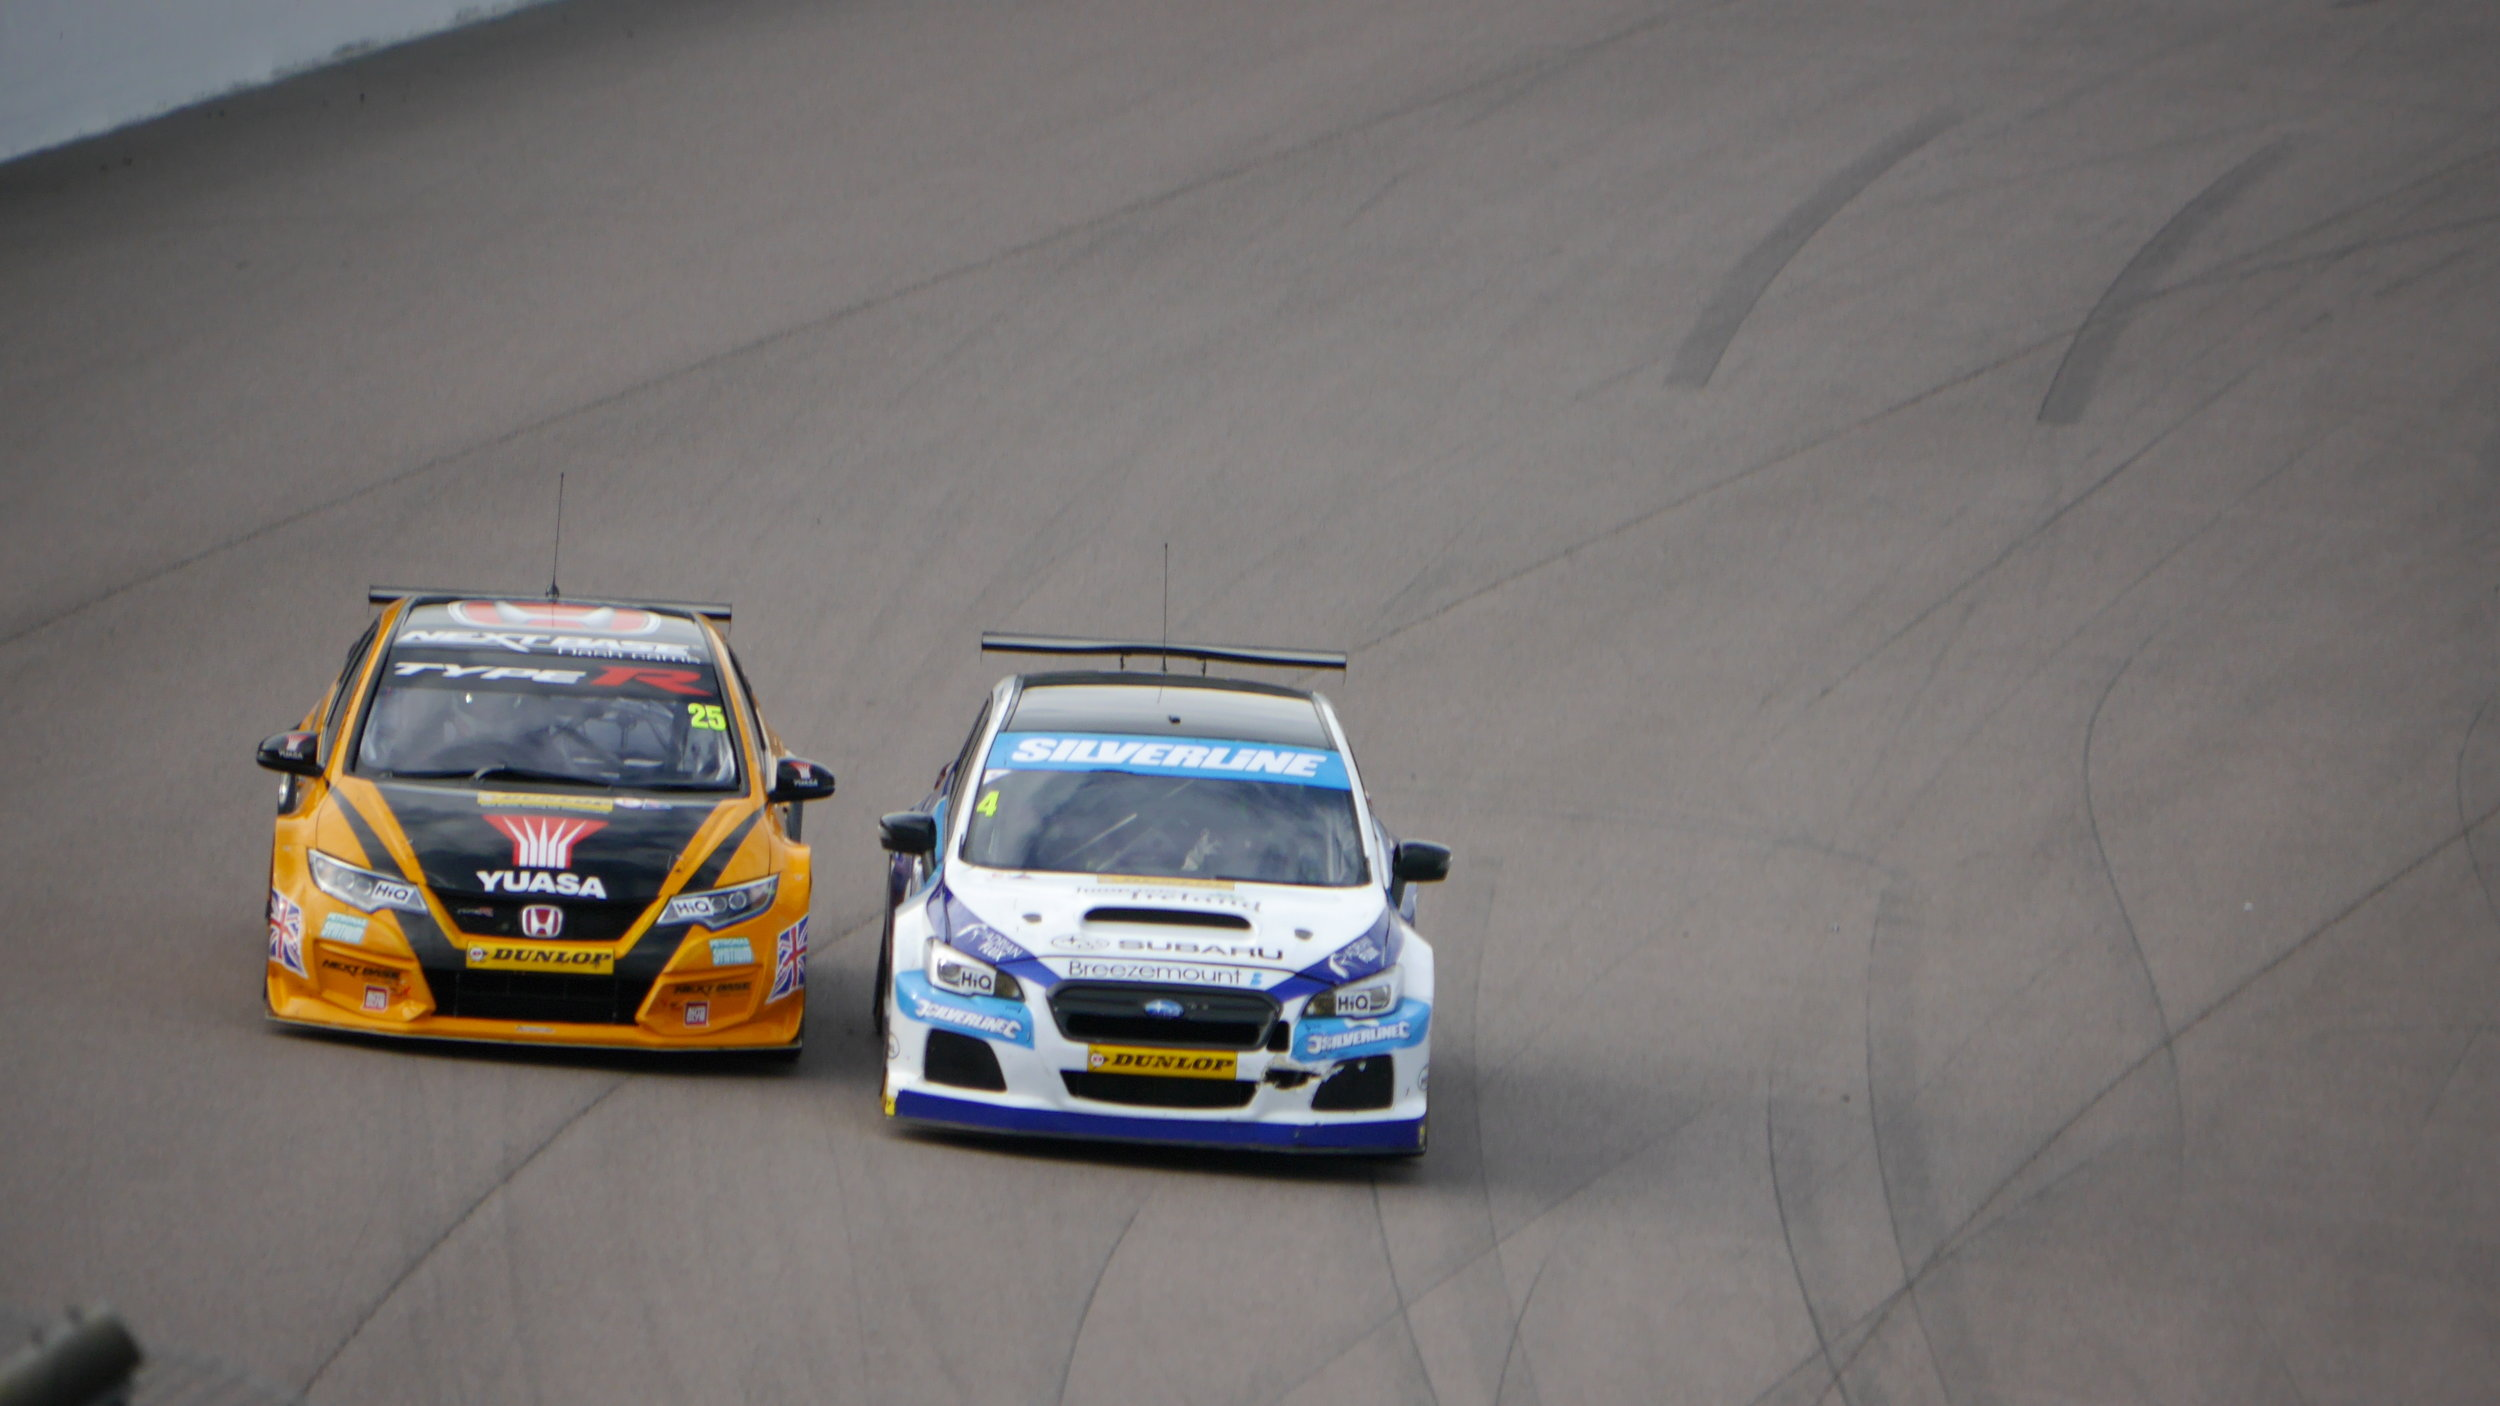 Colin Turkington passes Matt Neal for third place in race 3